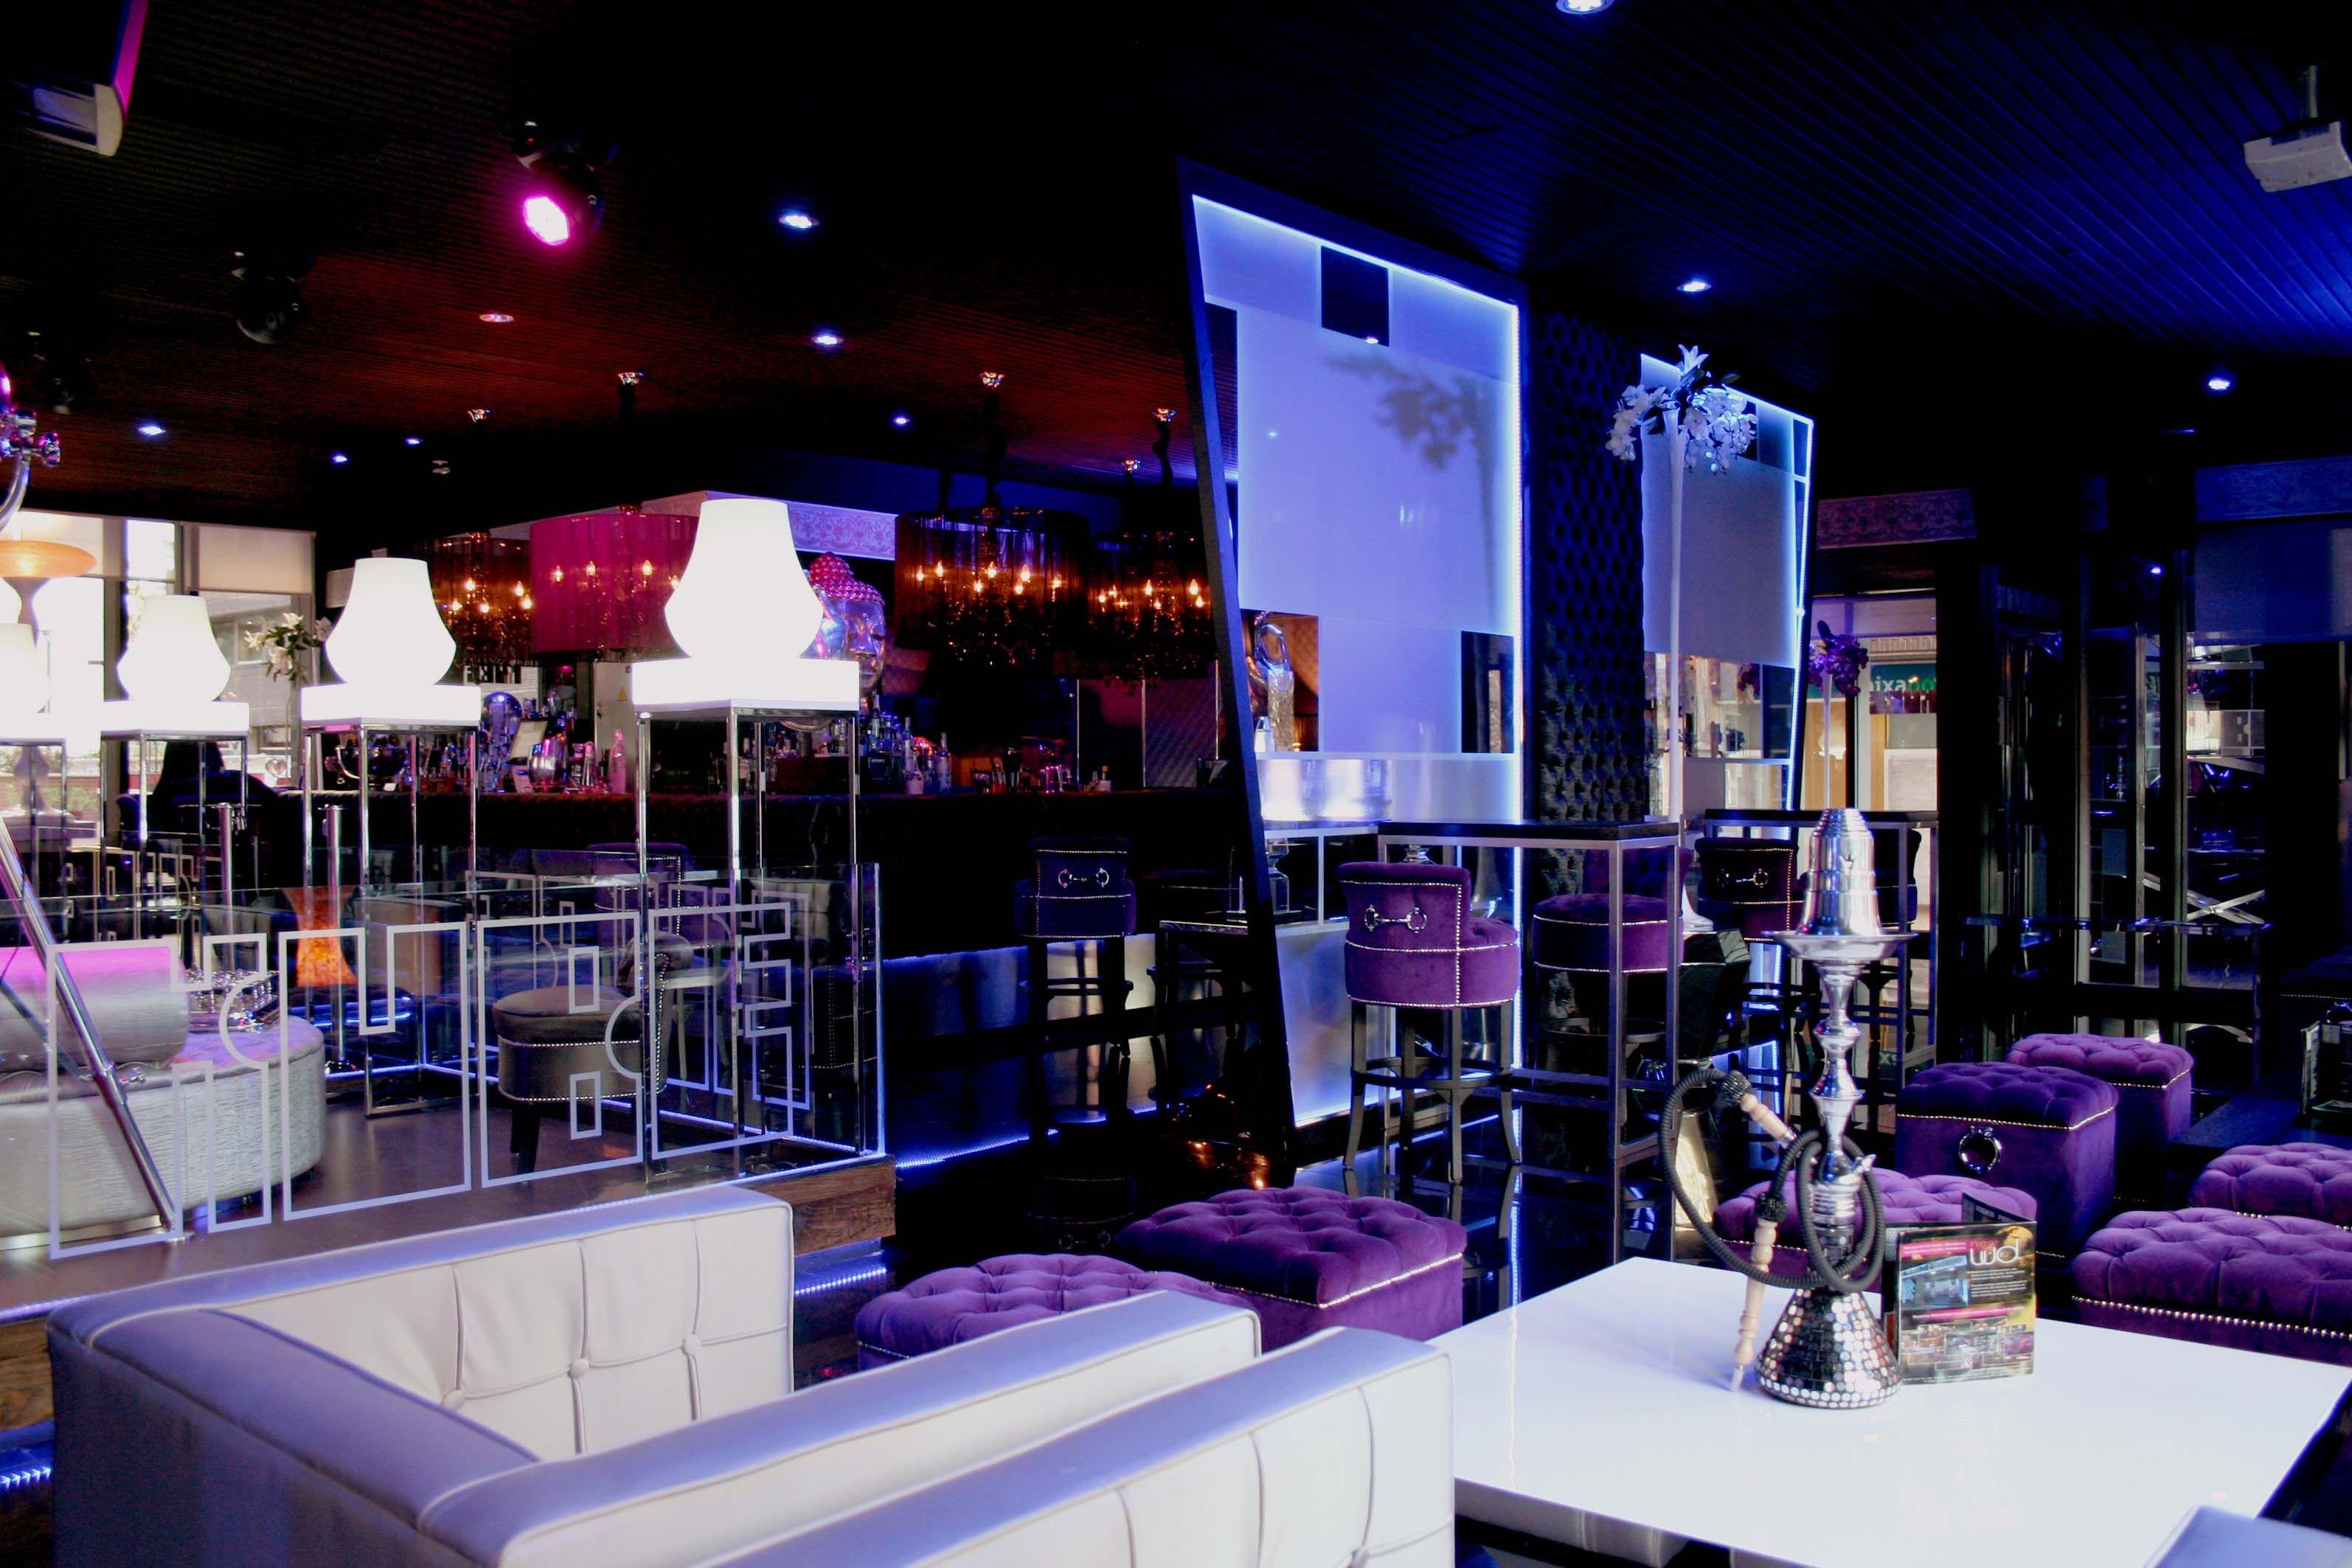 NewWD Decoracion de bares tematicos. Kube Madrid, decoracion moderna ...